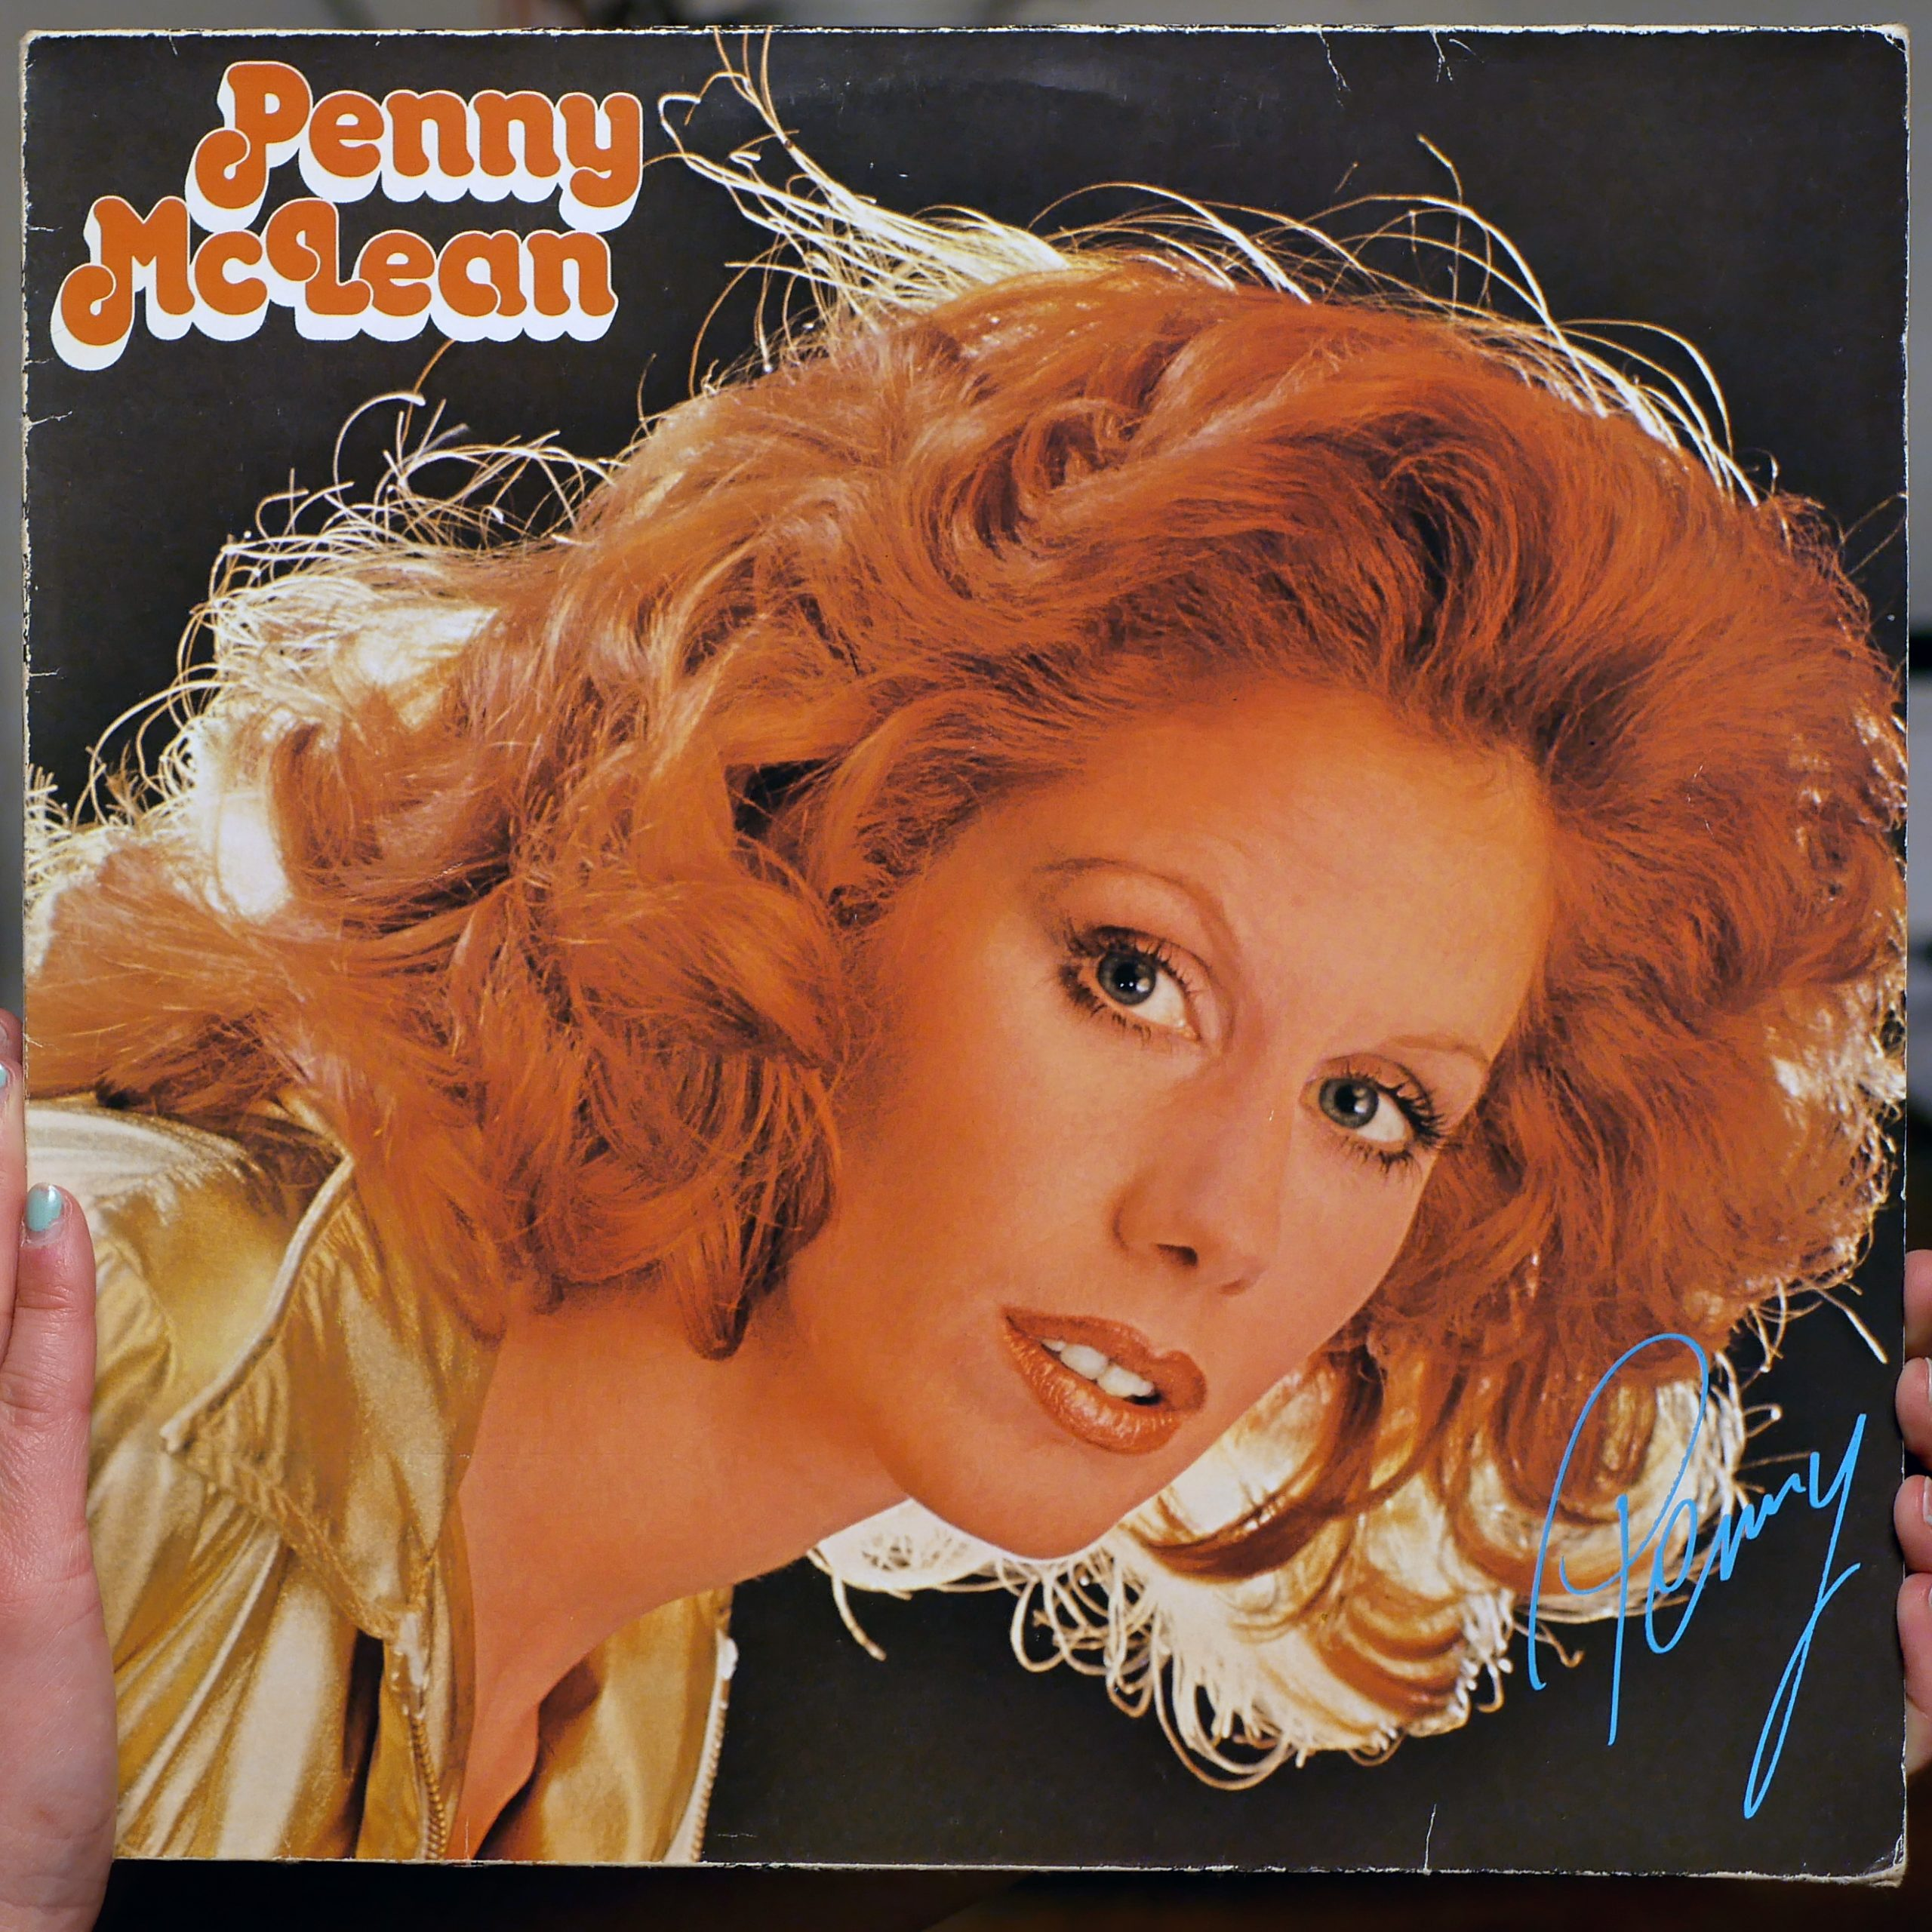 Penny McLean – Penny